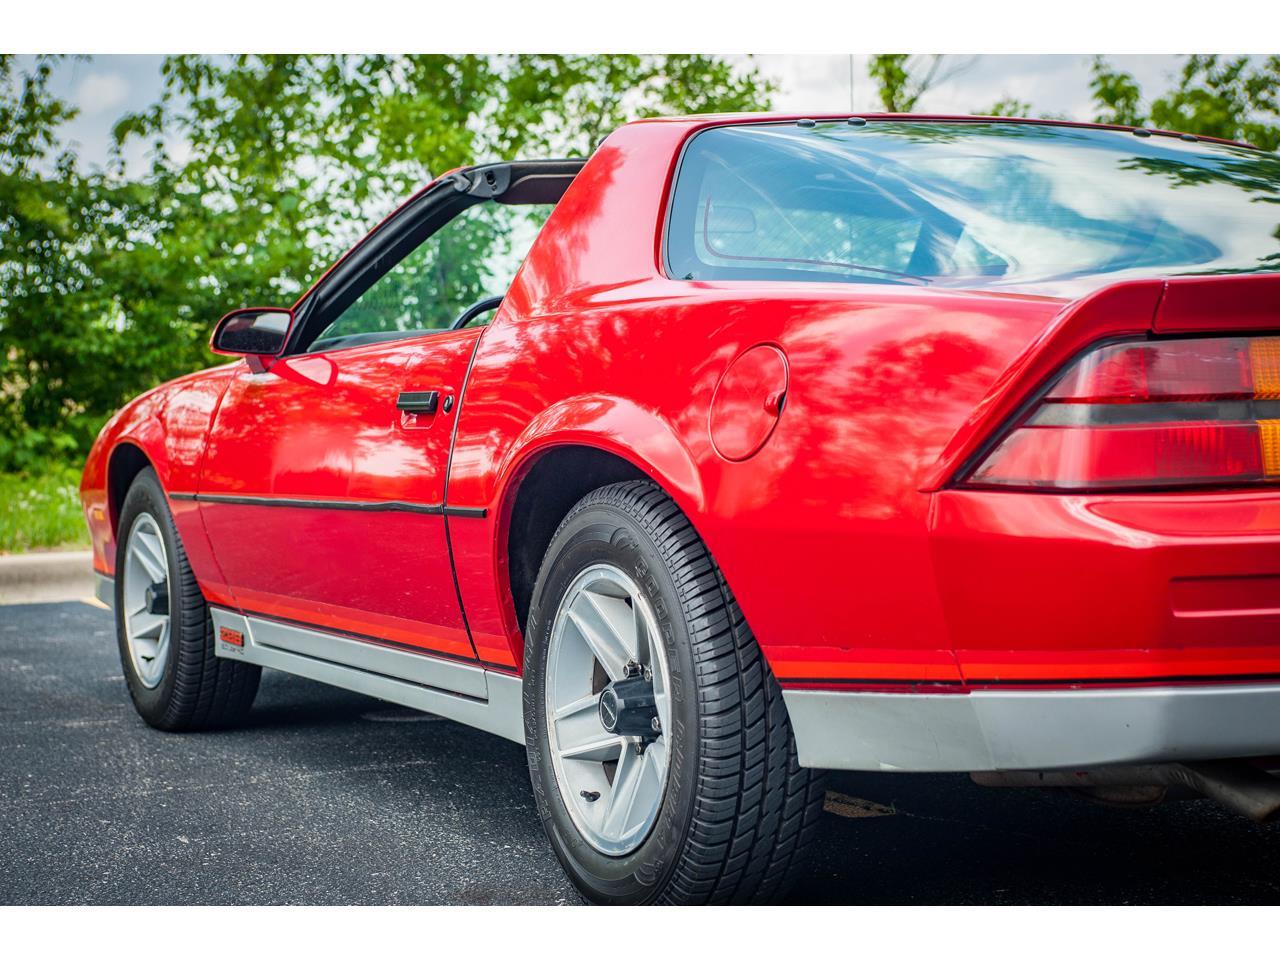 Large Picture of '84 Chevrolet Camaro located in O'Fallon Illinois - QB9Y